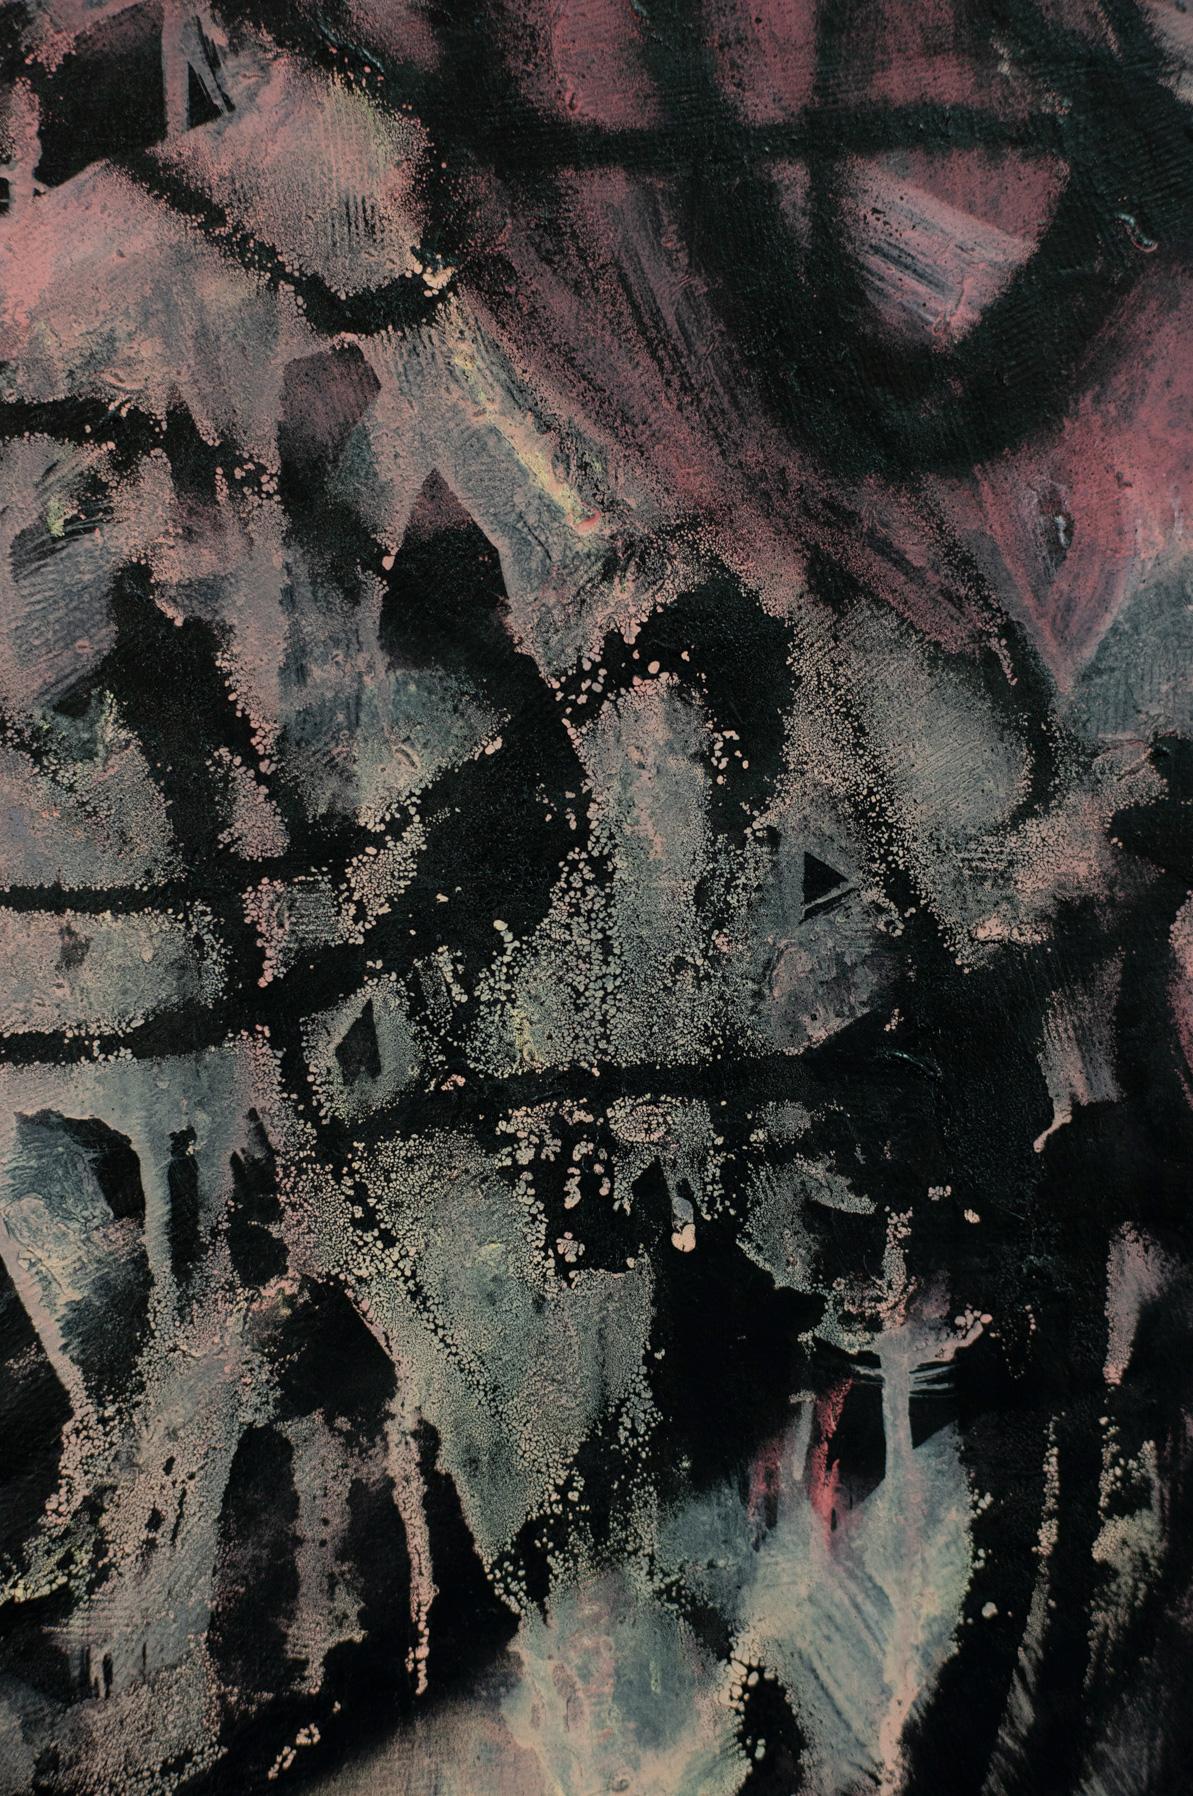 james watkins artist painter0013